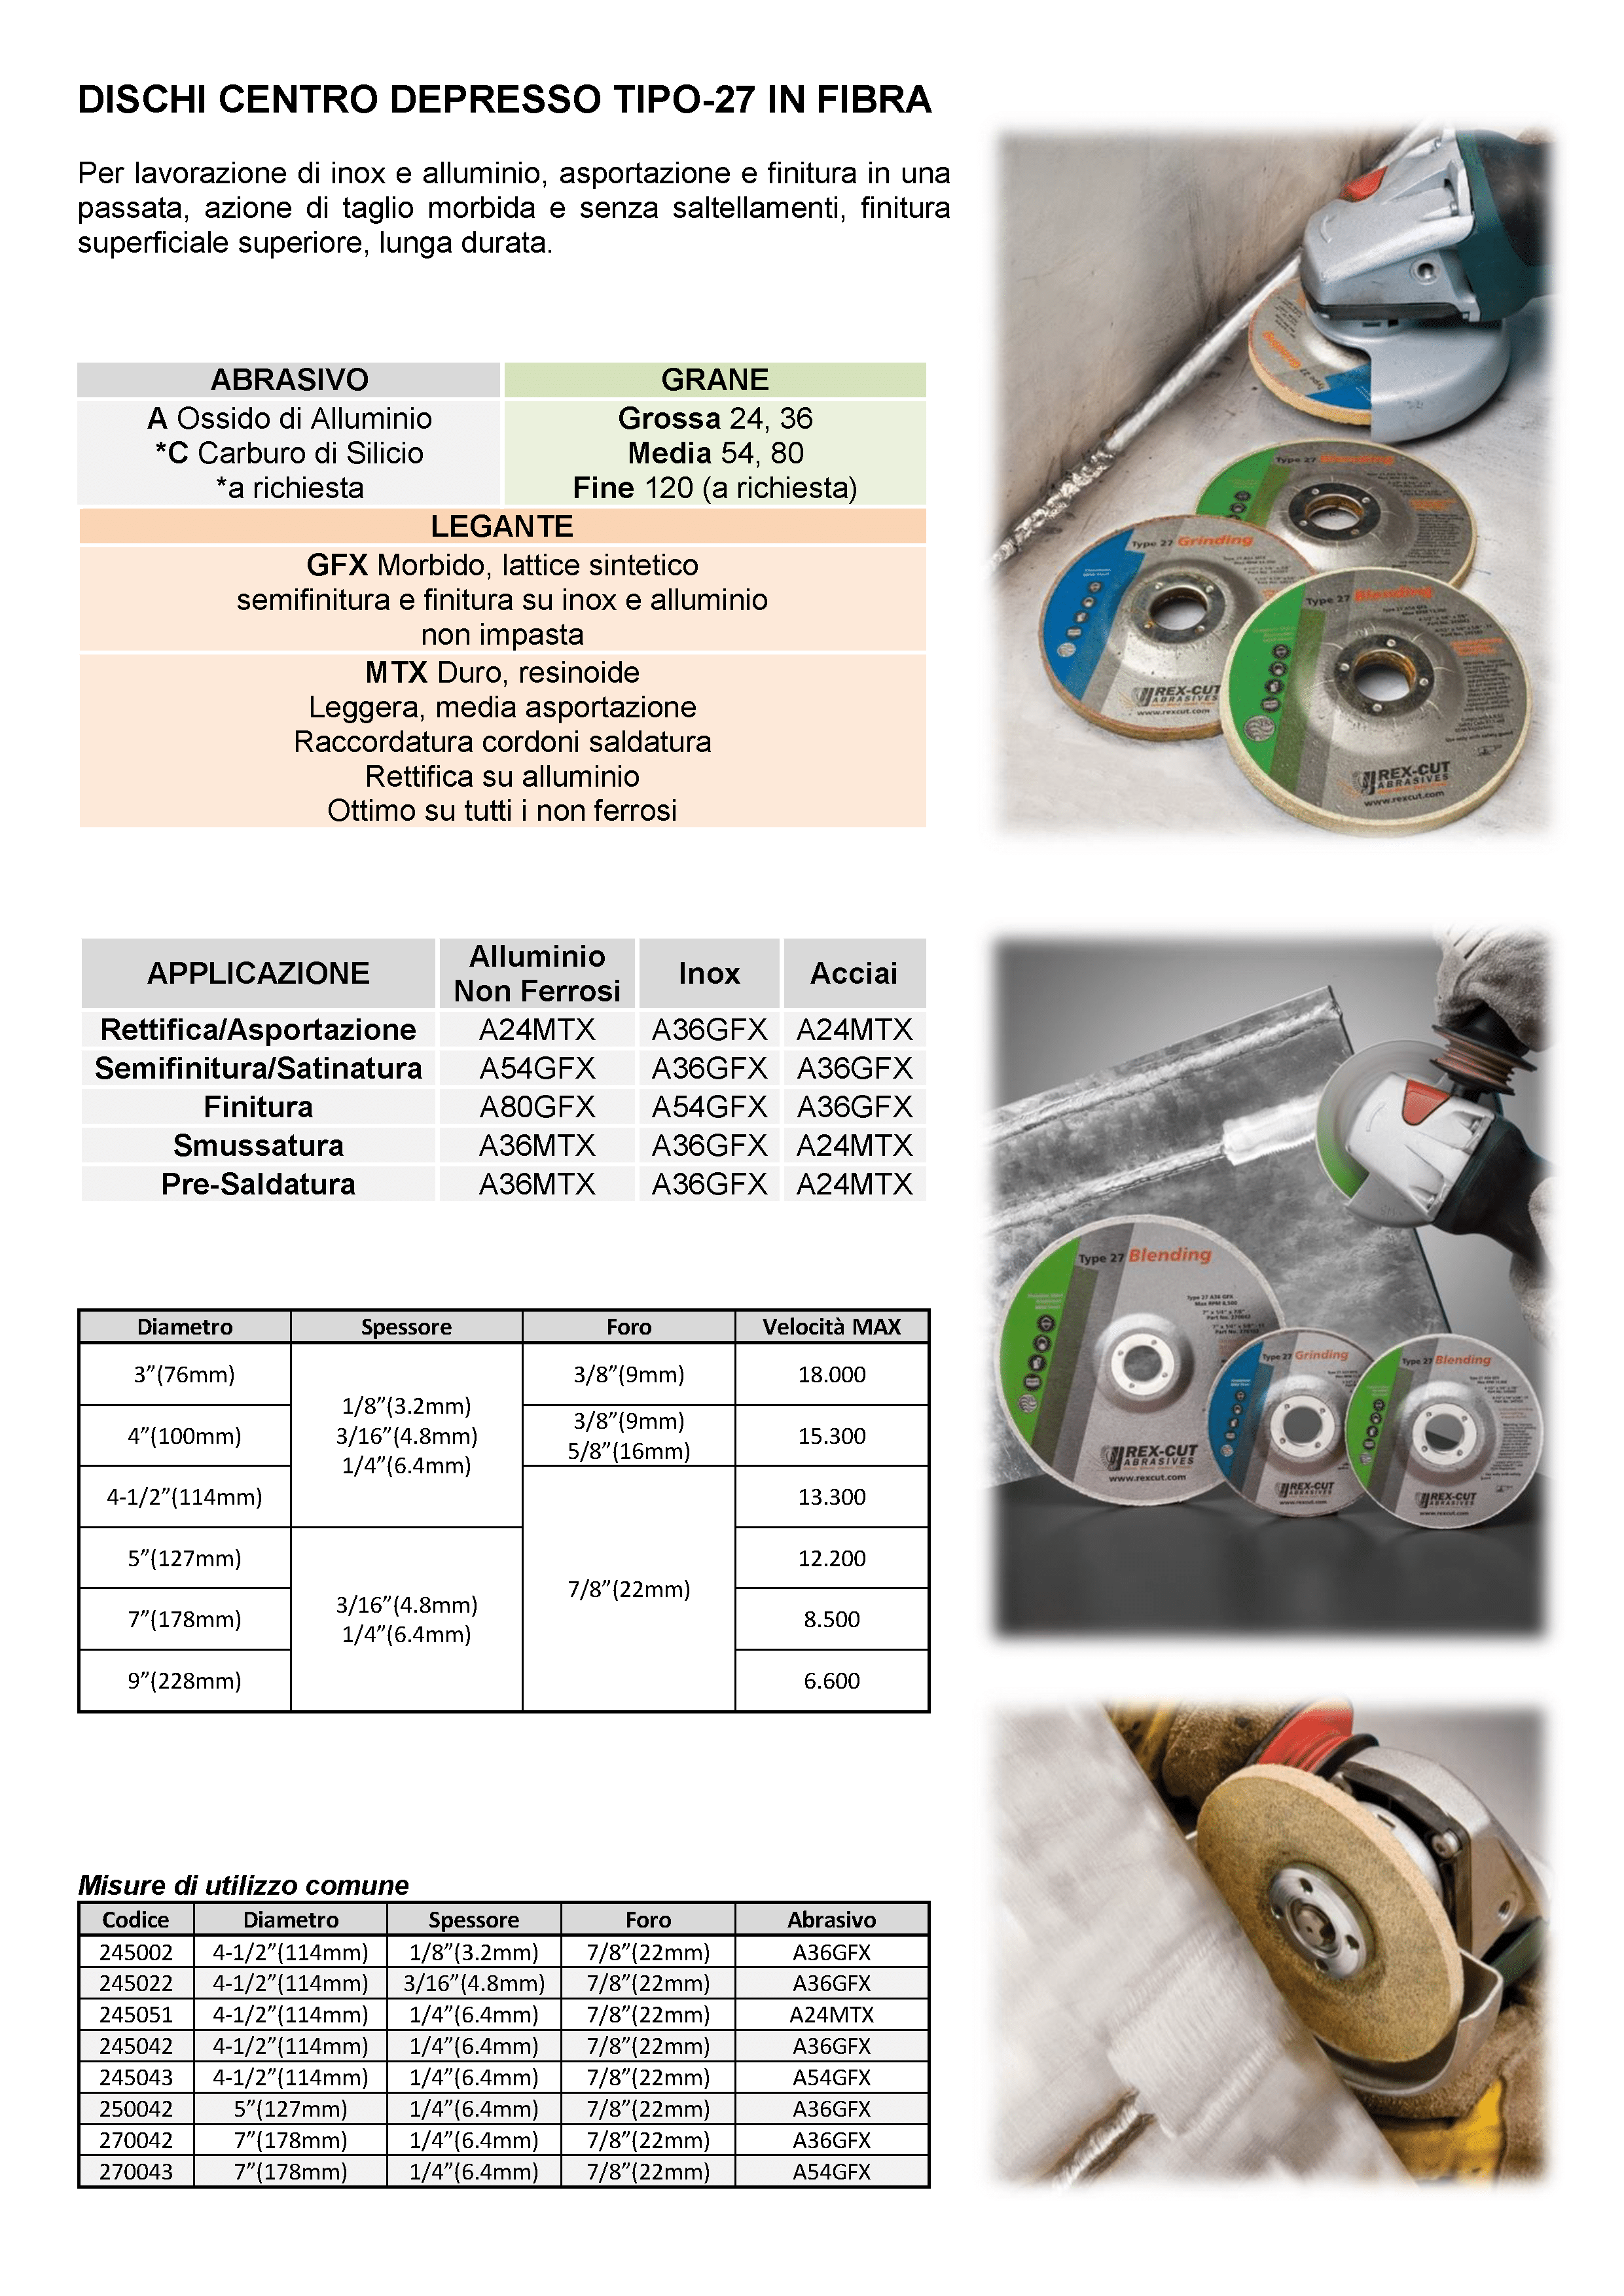 rex-cut-abrasivi-fibra-cotone-abrasivo-dischi-centro-depresso-tipo-27